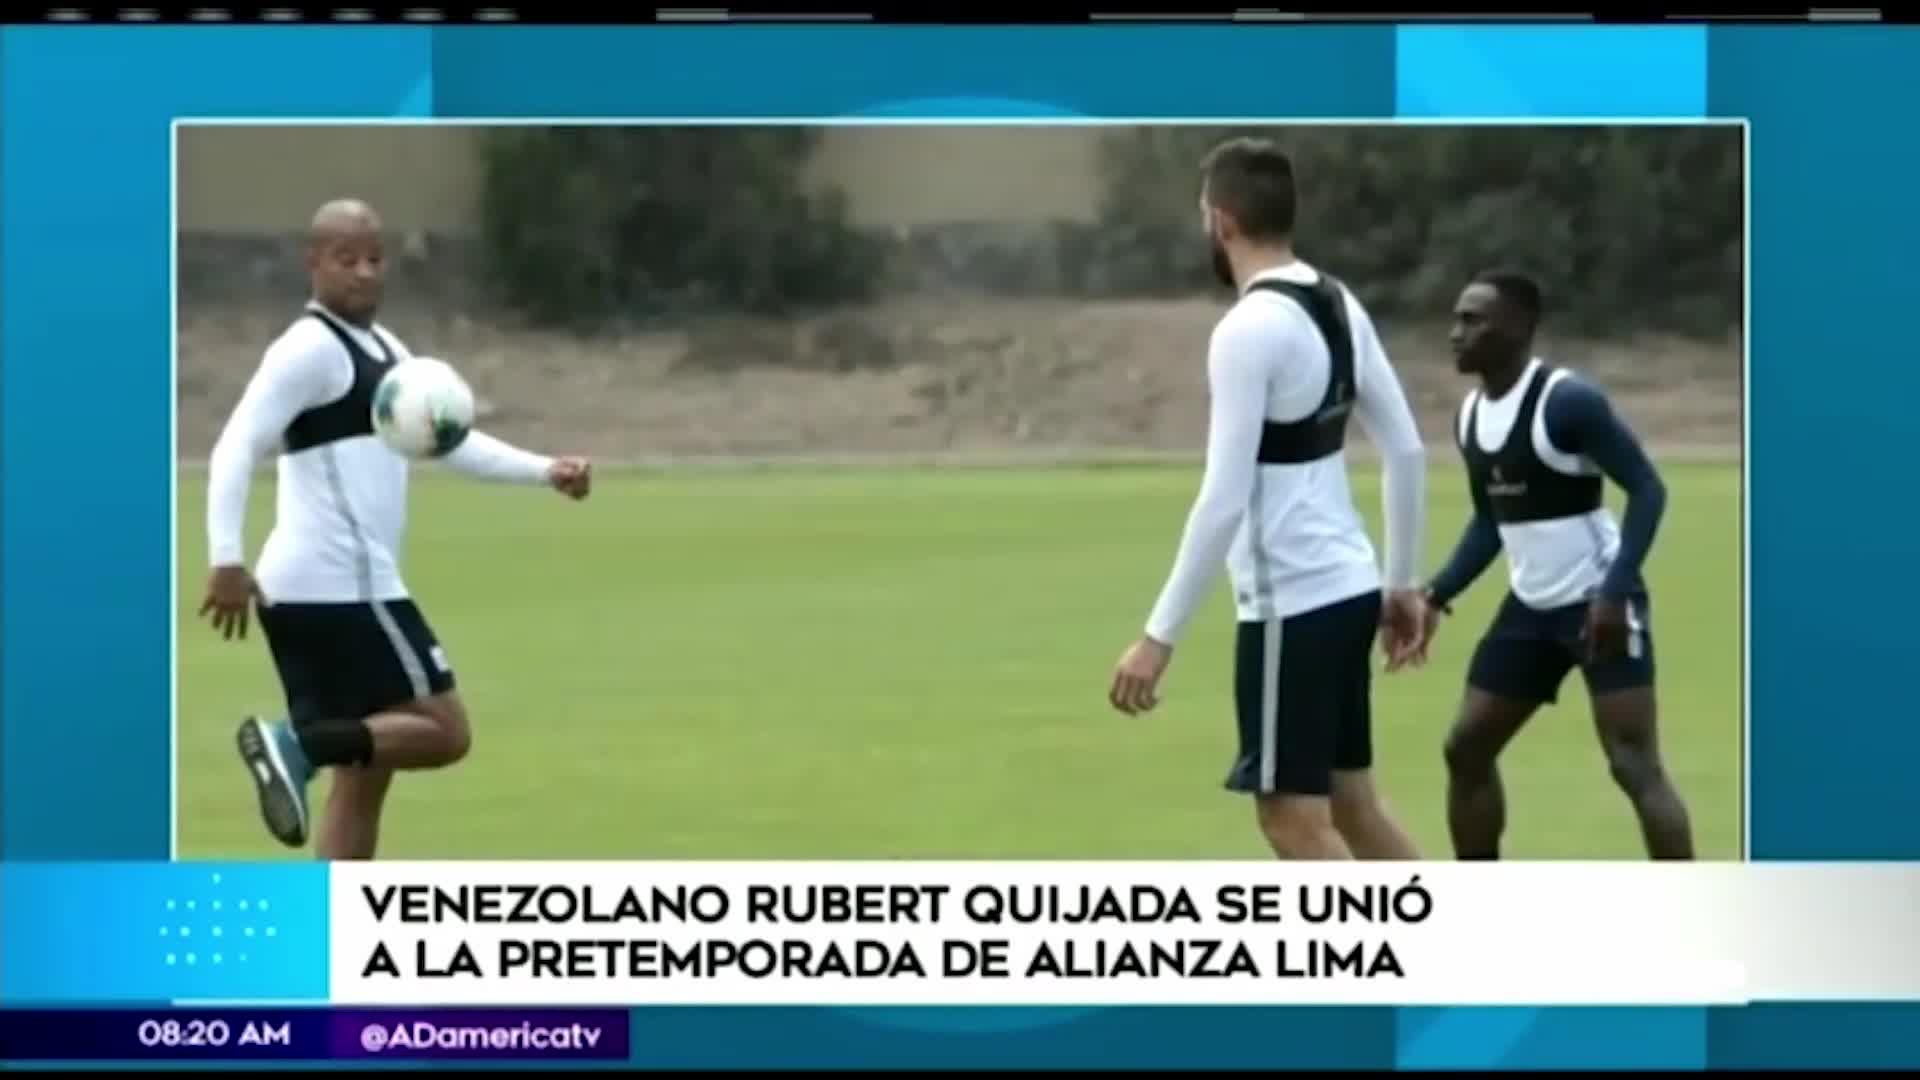 Rubert Quijada inició la pretemporada con Alianza Lima